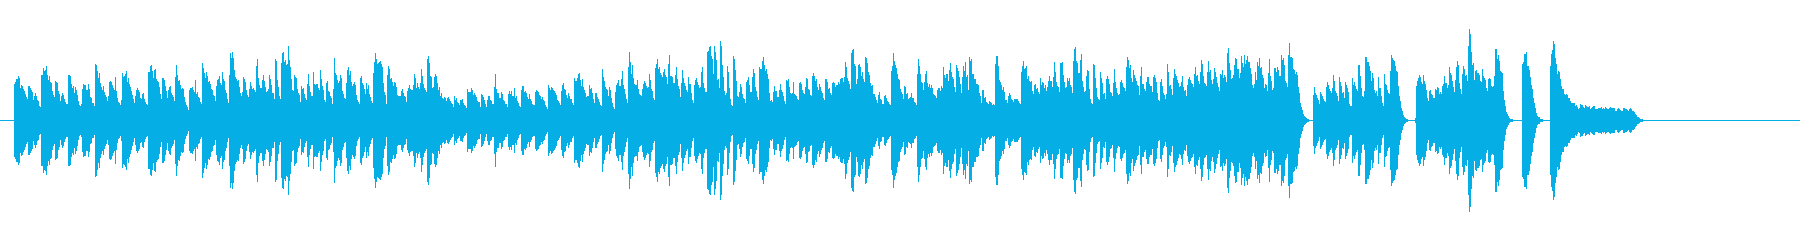 子供 練習曲 音楽室 発表会の再生済みの波形